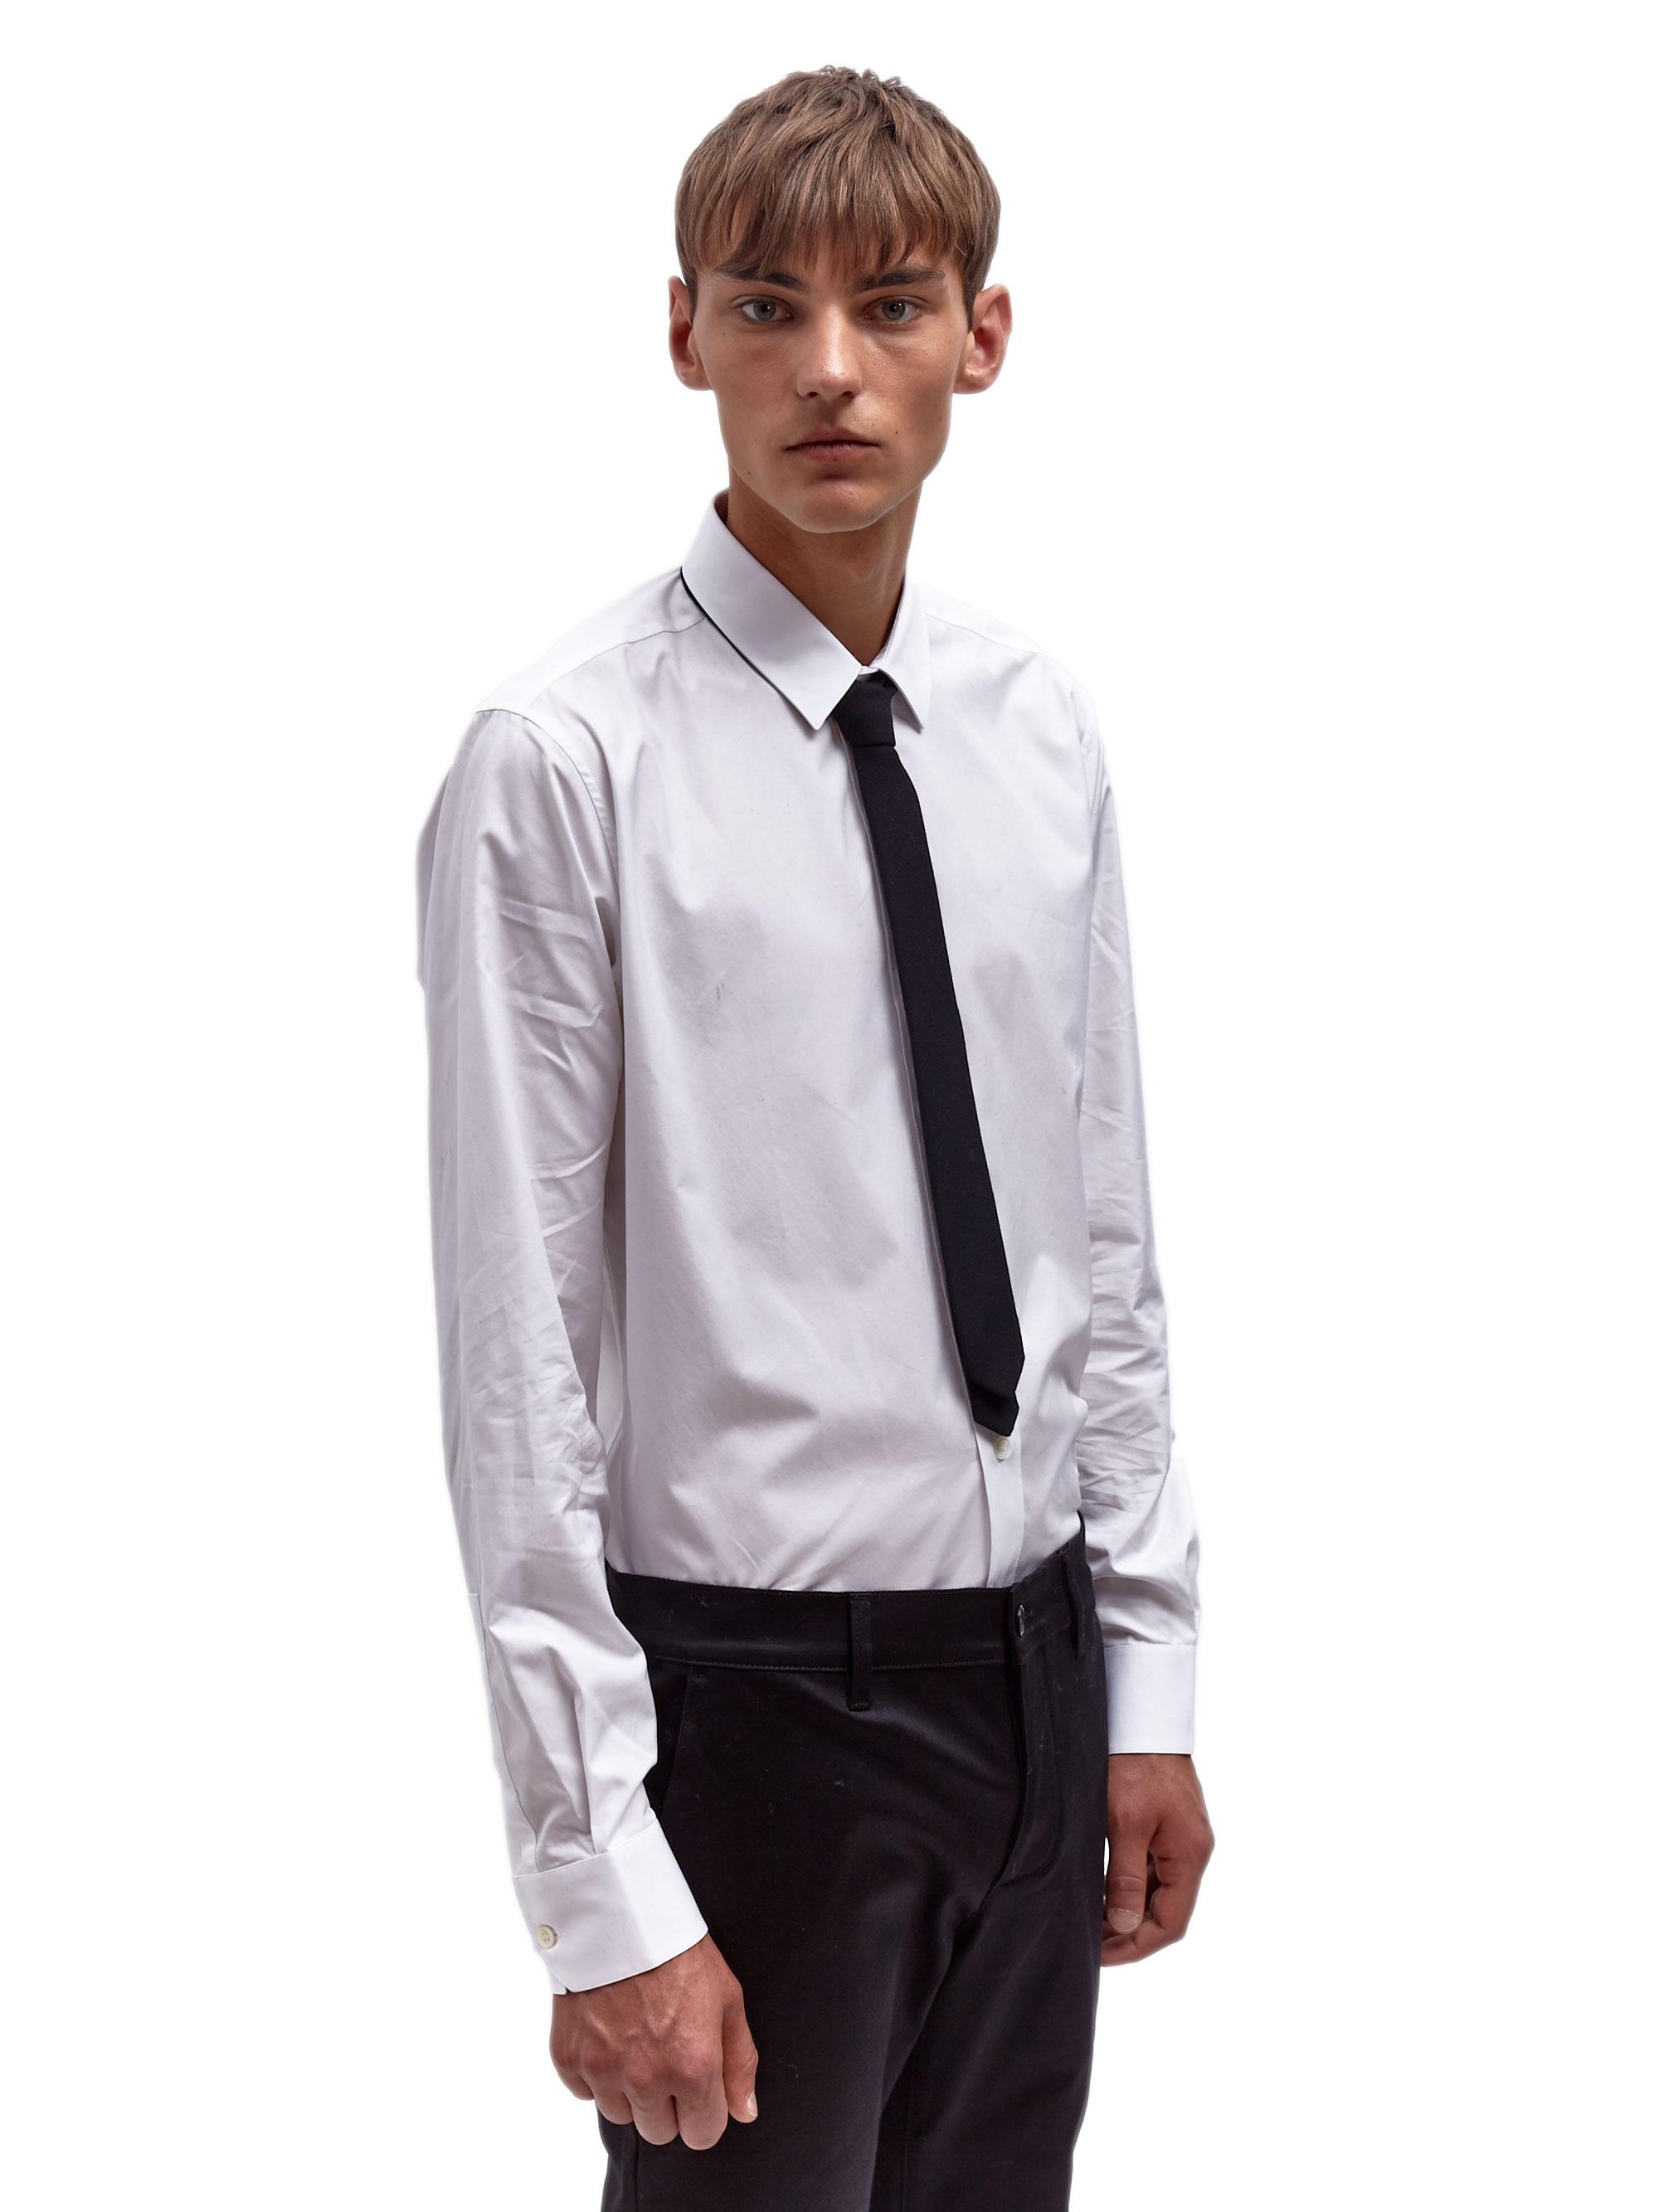 White Dress Shirt With Skinny Black Tie Bcd Tofu House